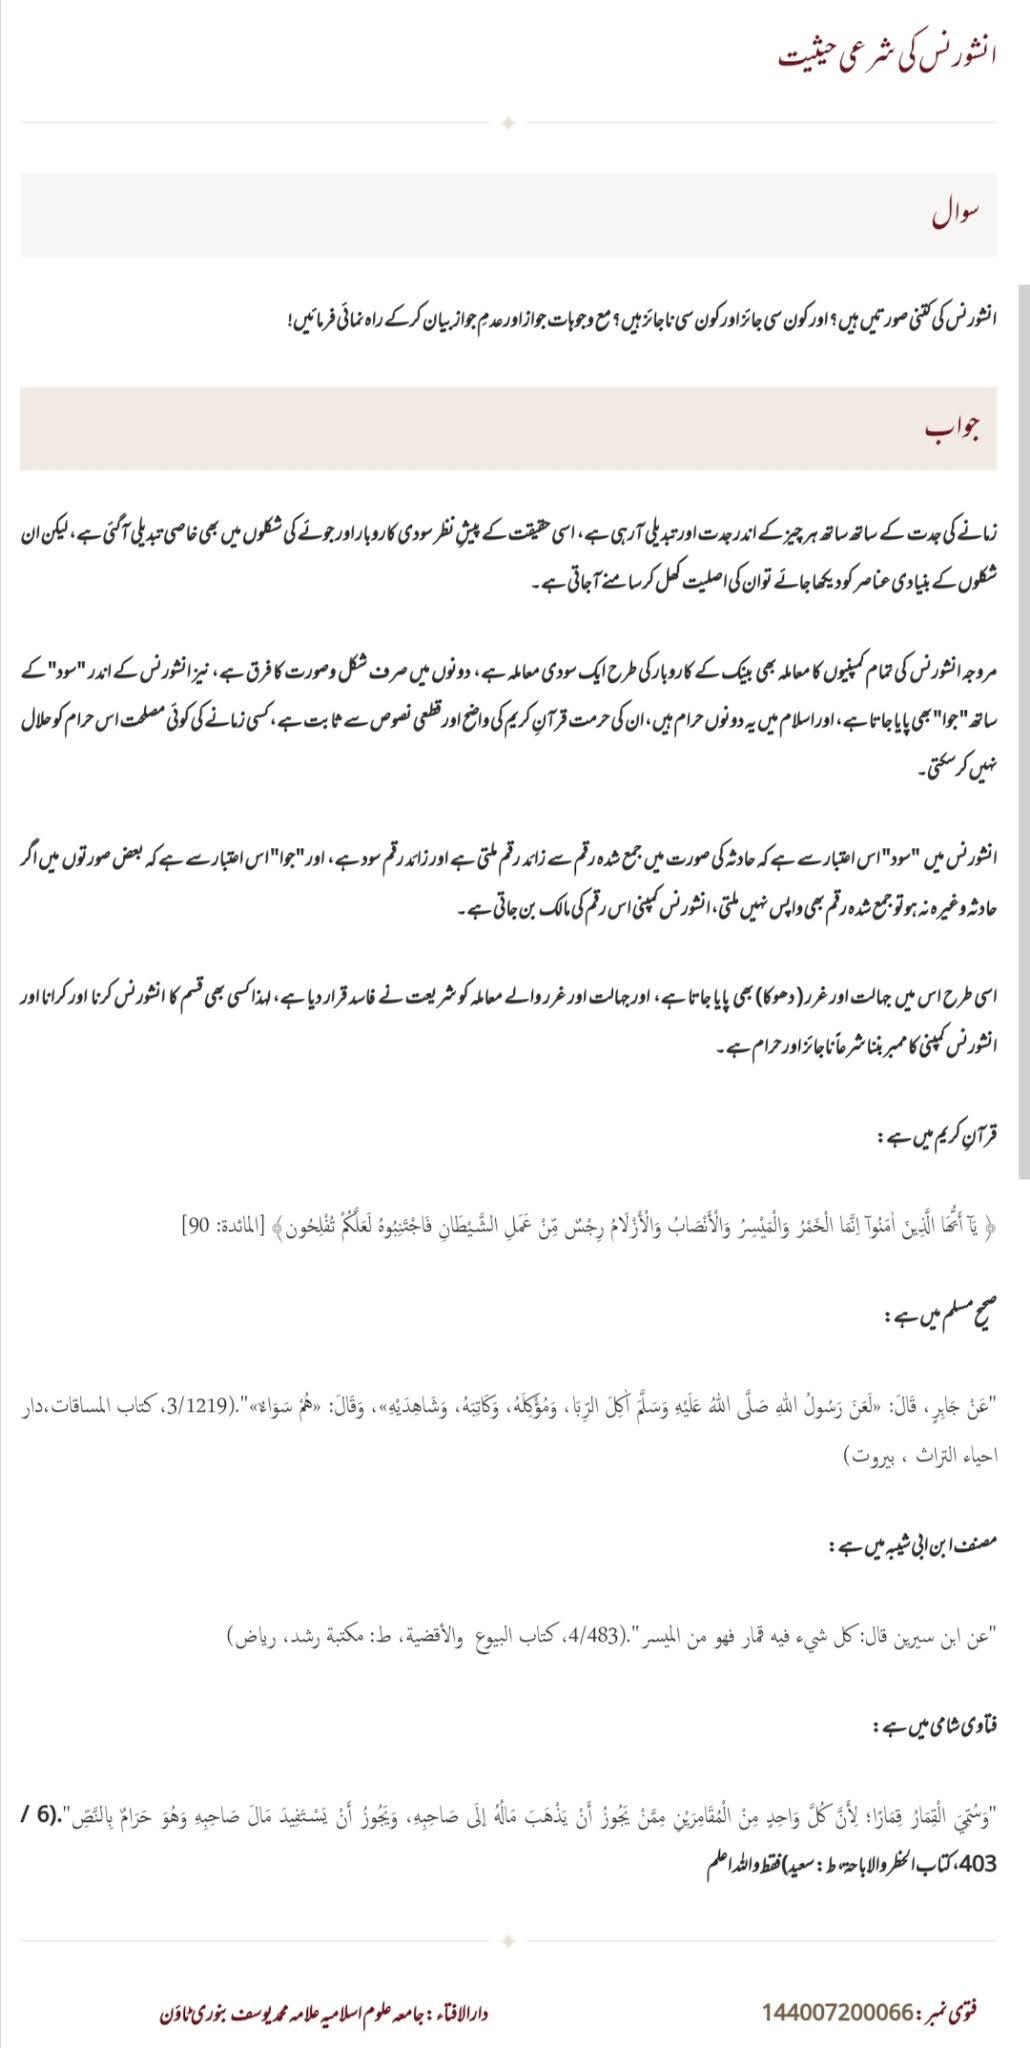 Insurance in Islam انشورنس کی شرعی حیثیت